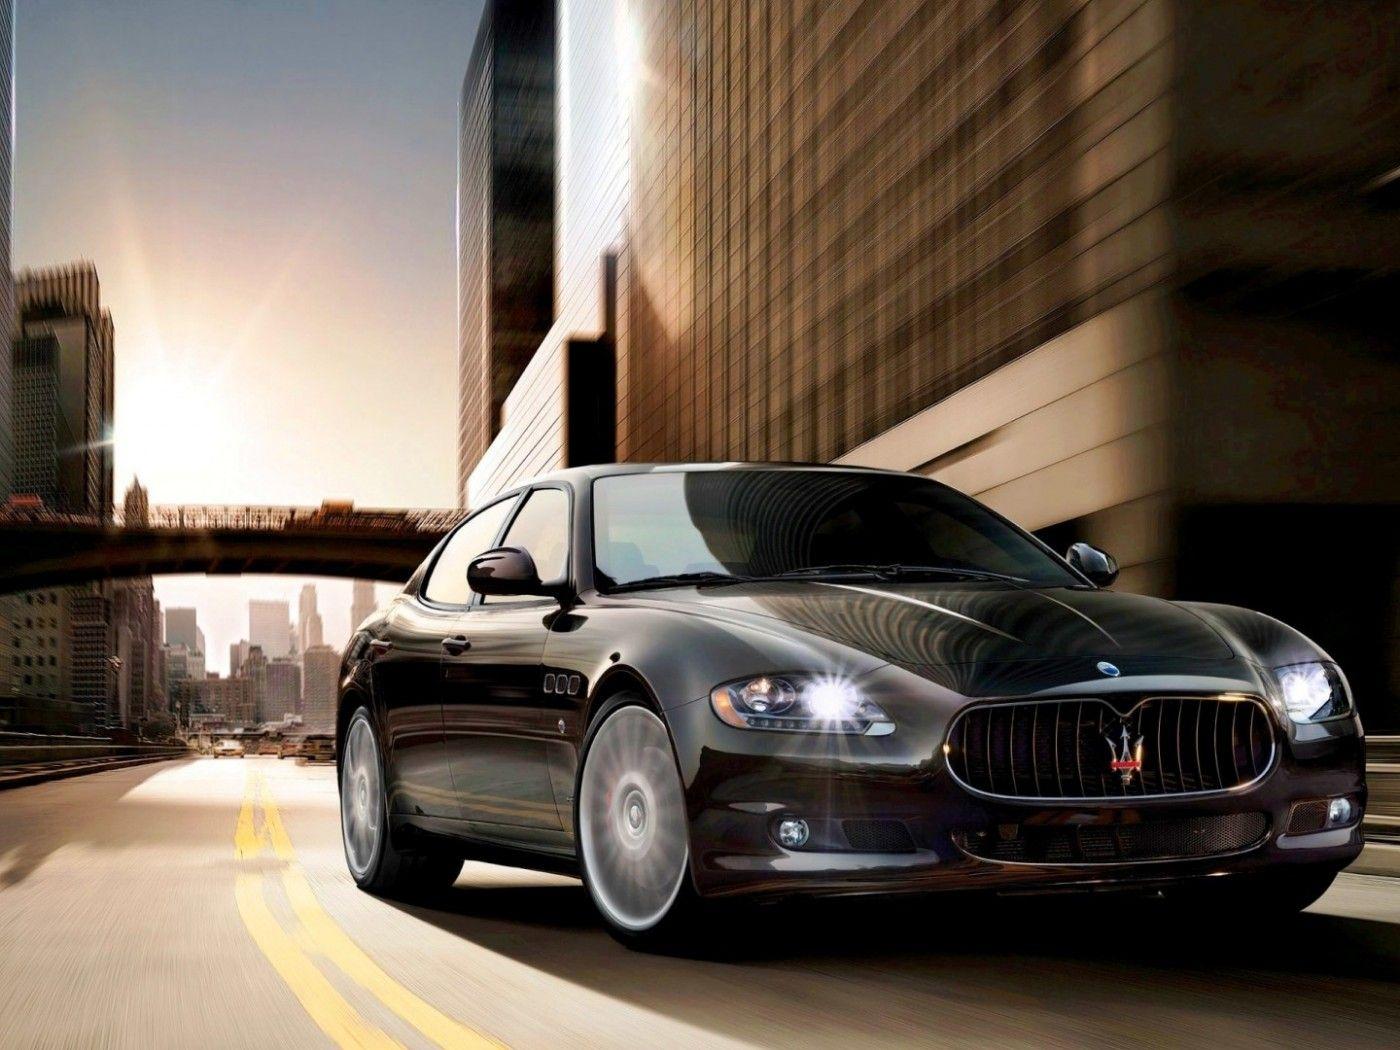 Elegant Stunning Black Maserati Quattroporte Wallpaper Awesome Design